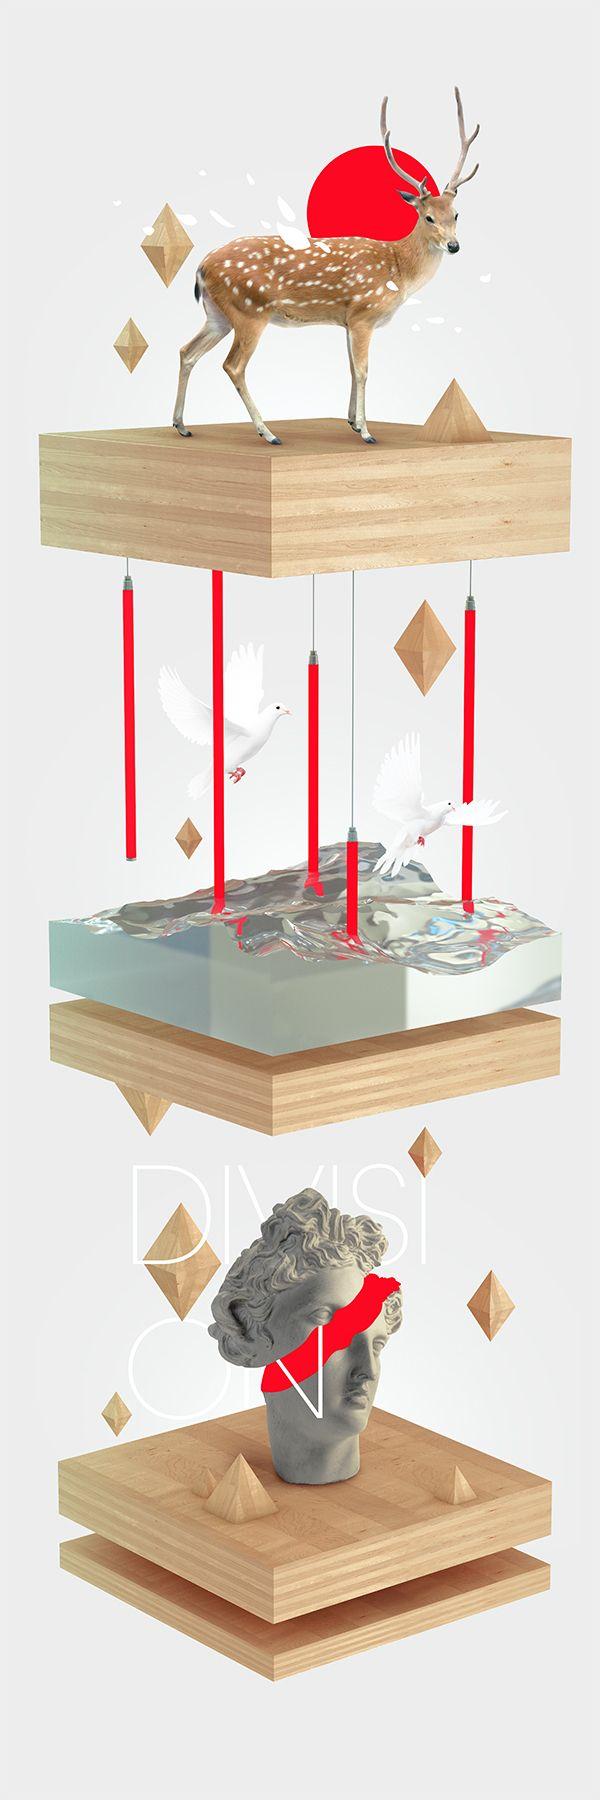 Division by Sean Ostashek, via Behance